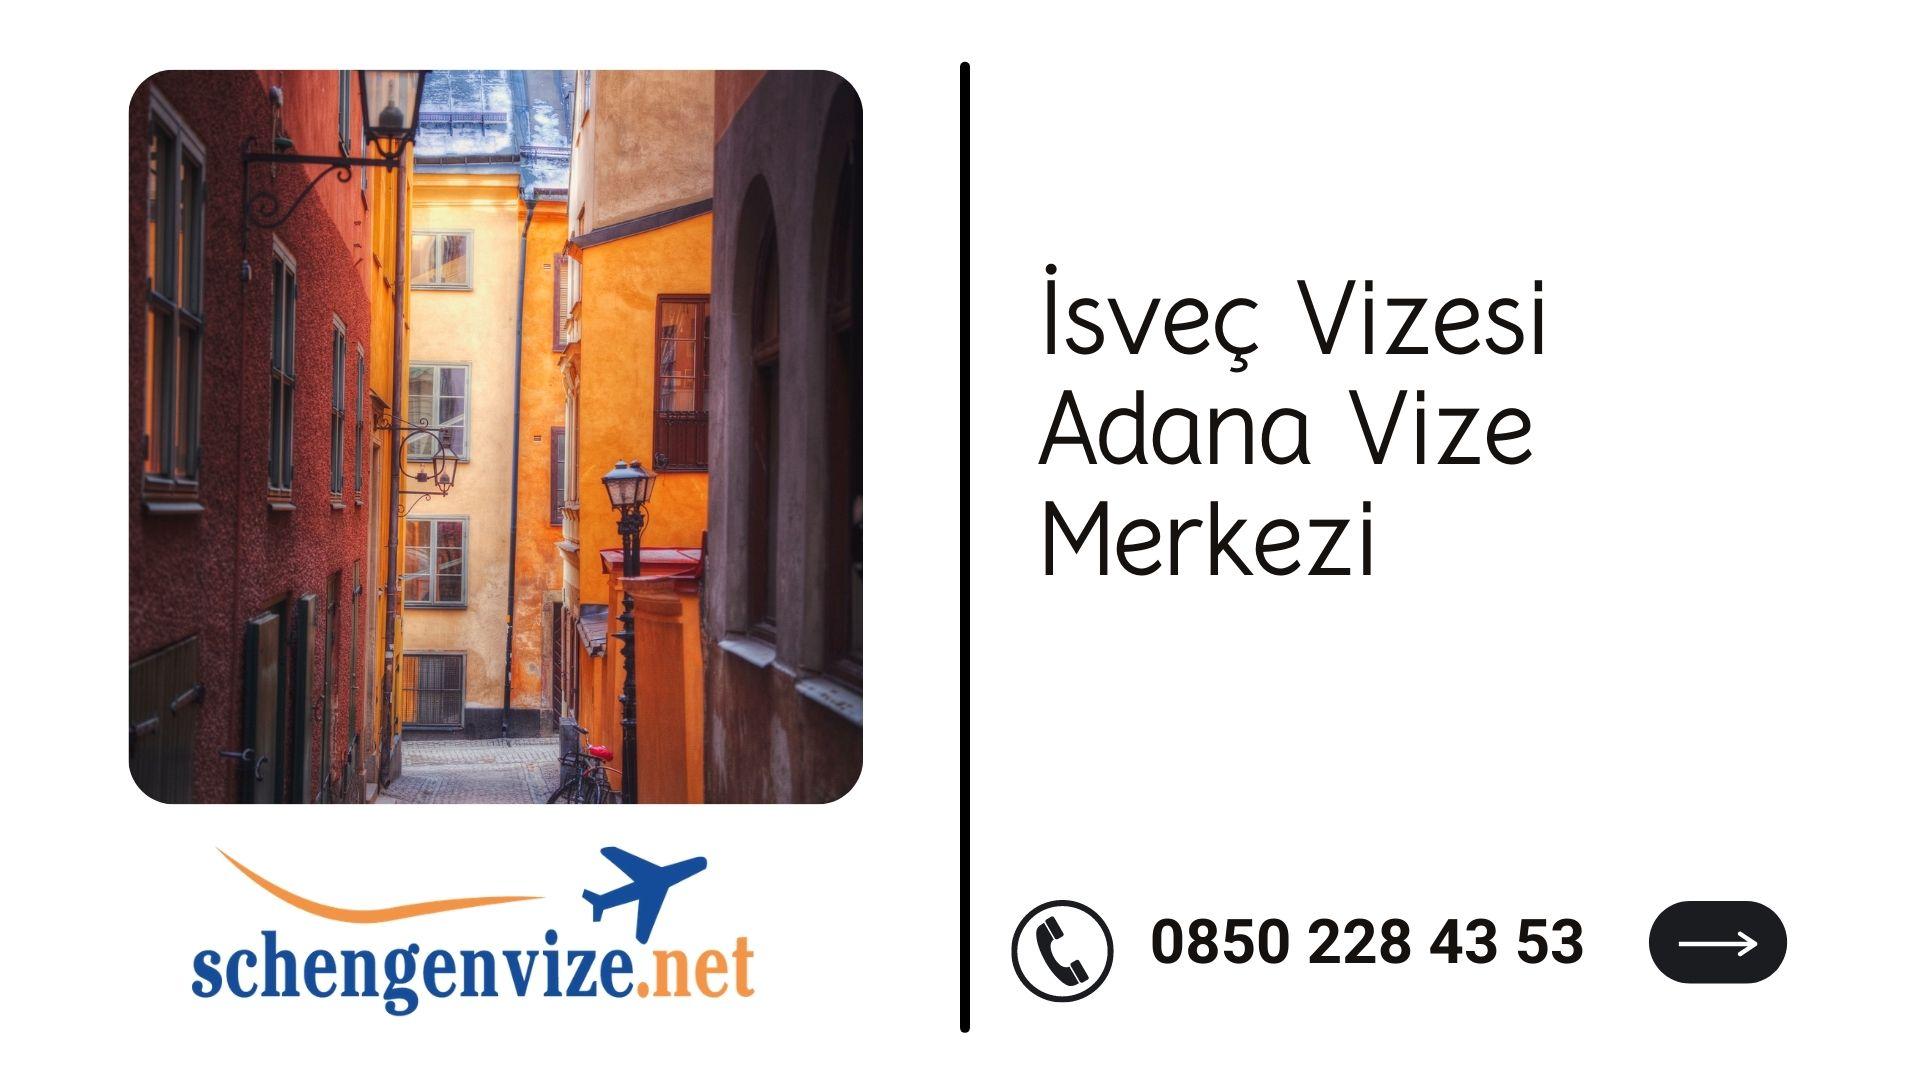 İsveç Vizesi Adana Vize Merkezi